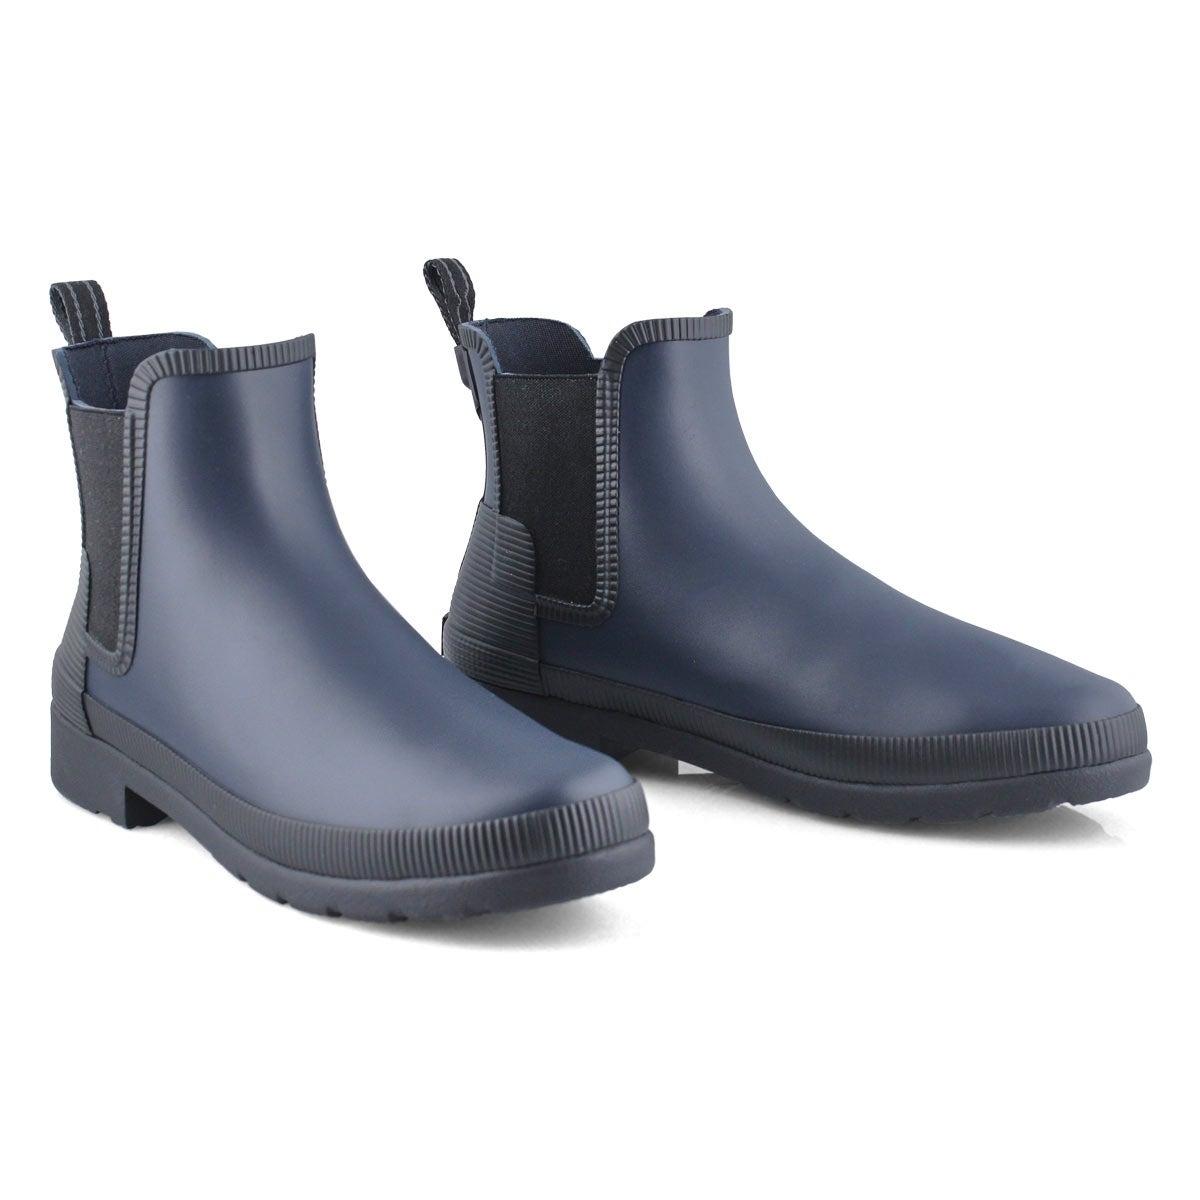 Women's Original Refined Chelsea Rain Boot - Ny/Bk